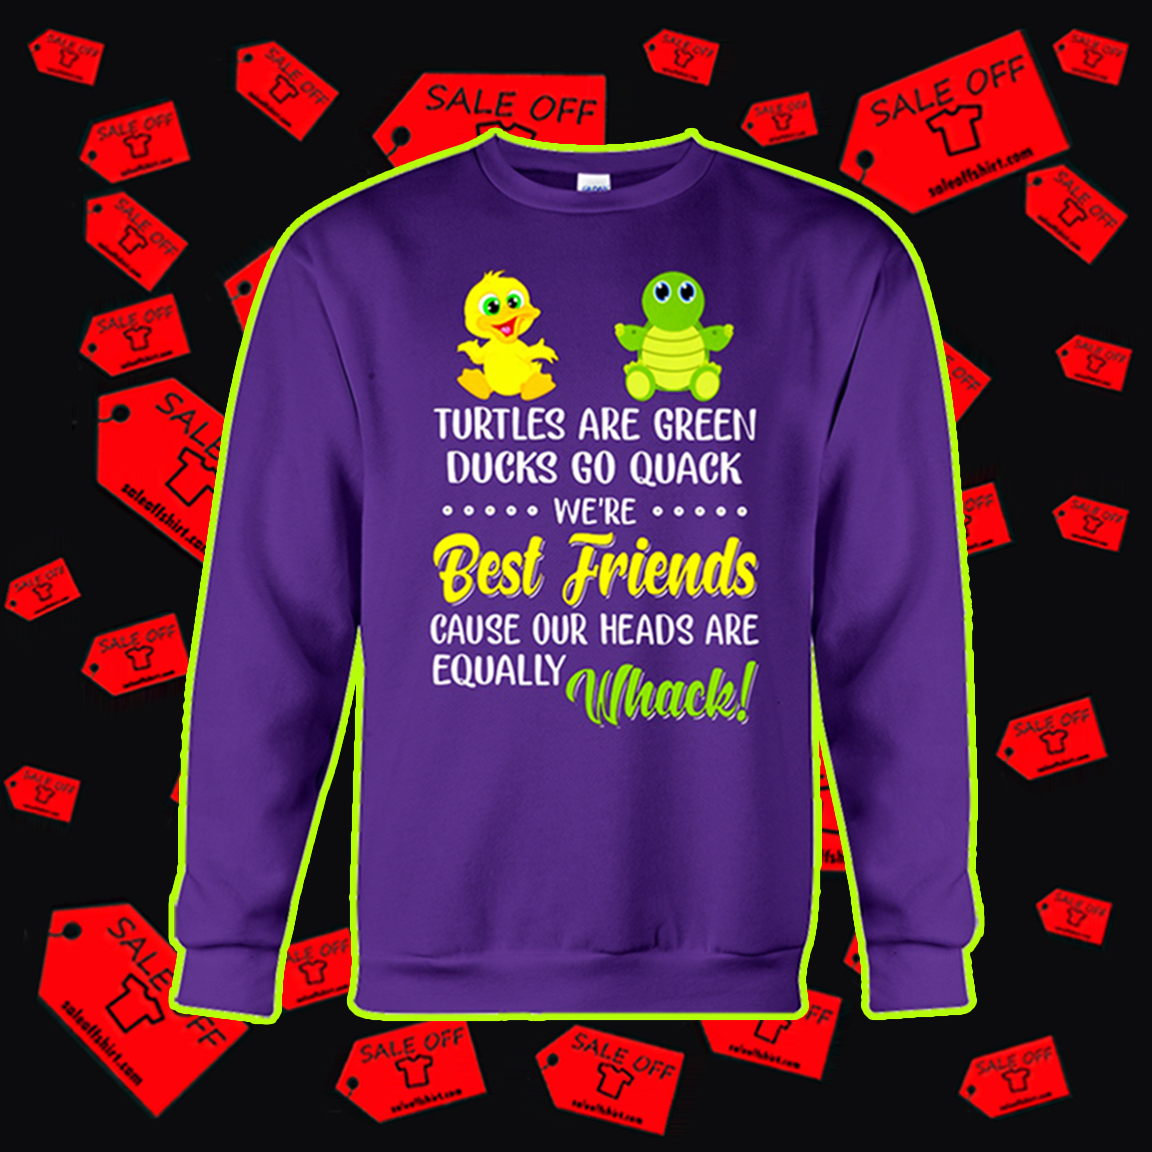 Turtles are green ducks go quack we're best friends sweatshirt